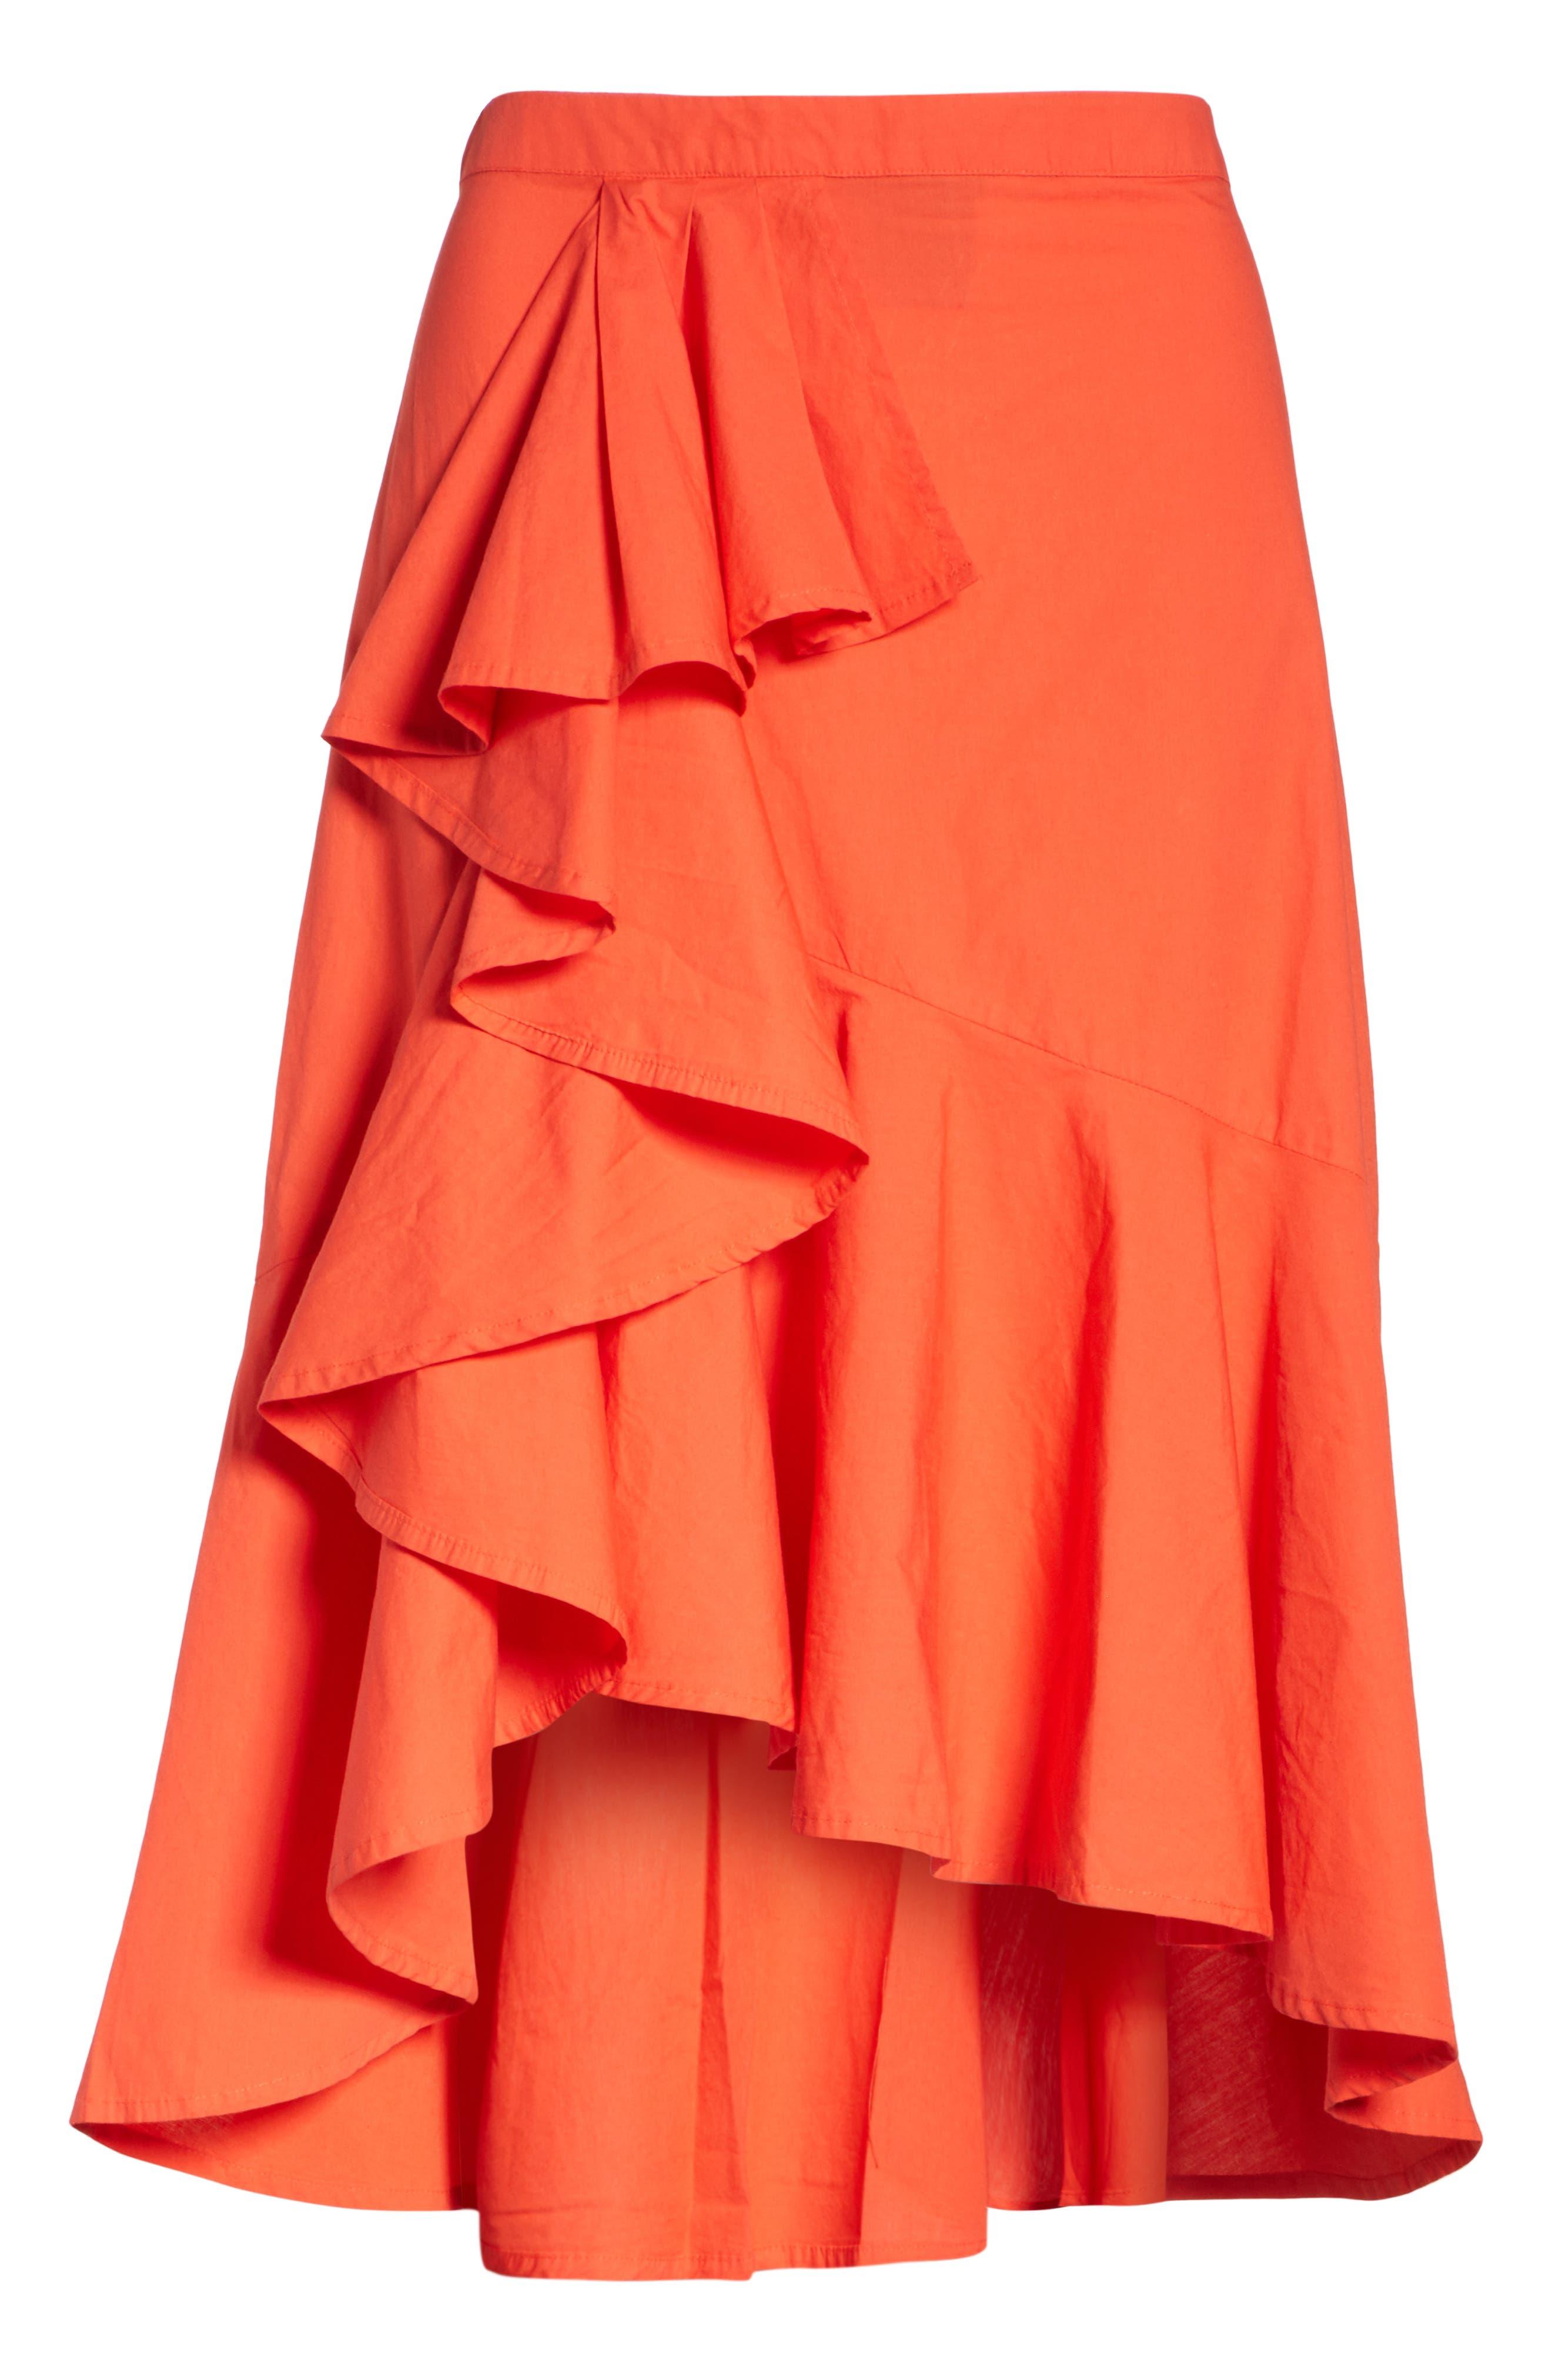 Chesmu Ruffled Cotton Skirt,                             Alternate thumbnail 6, color,                             Salsa